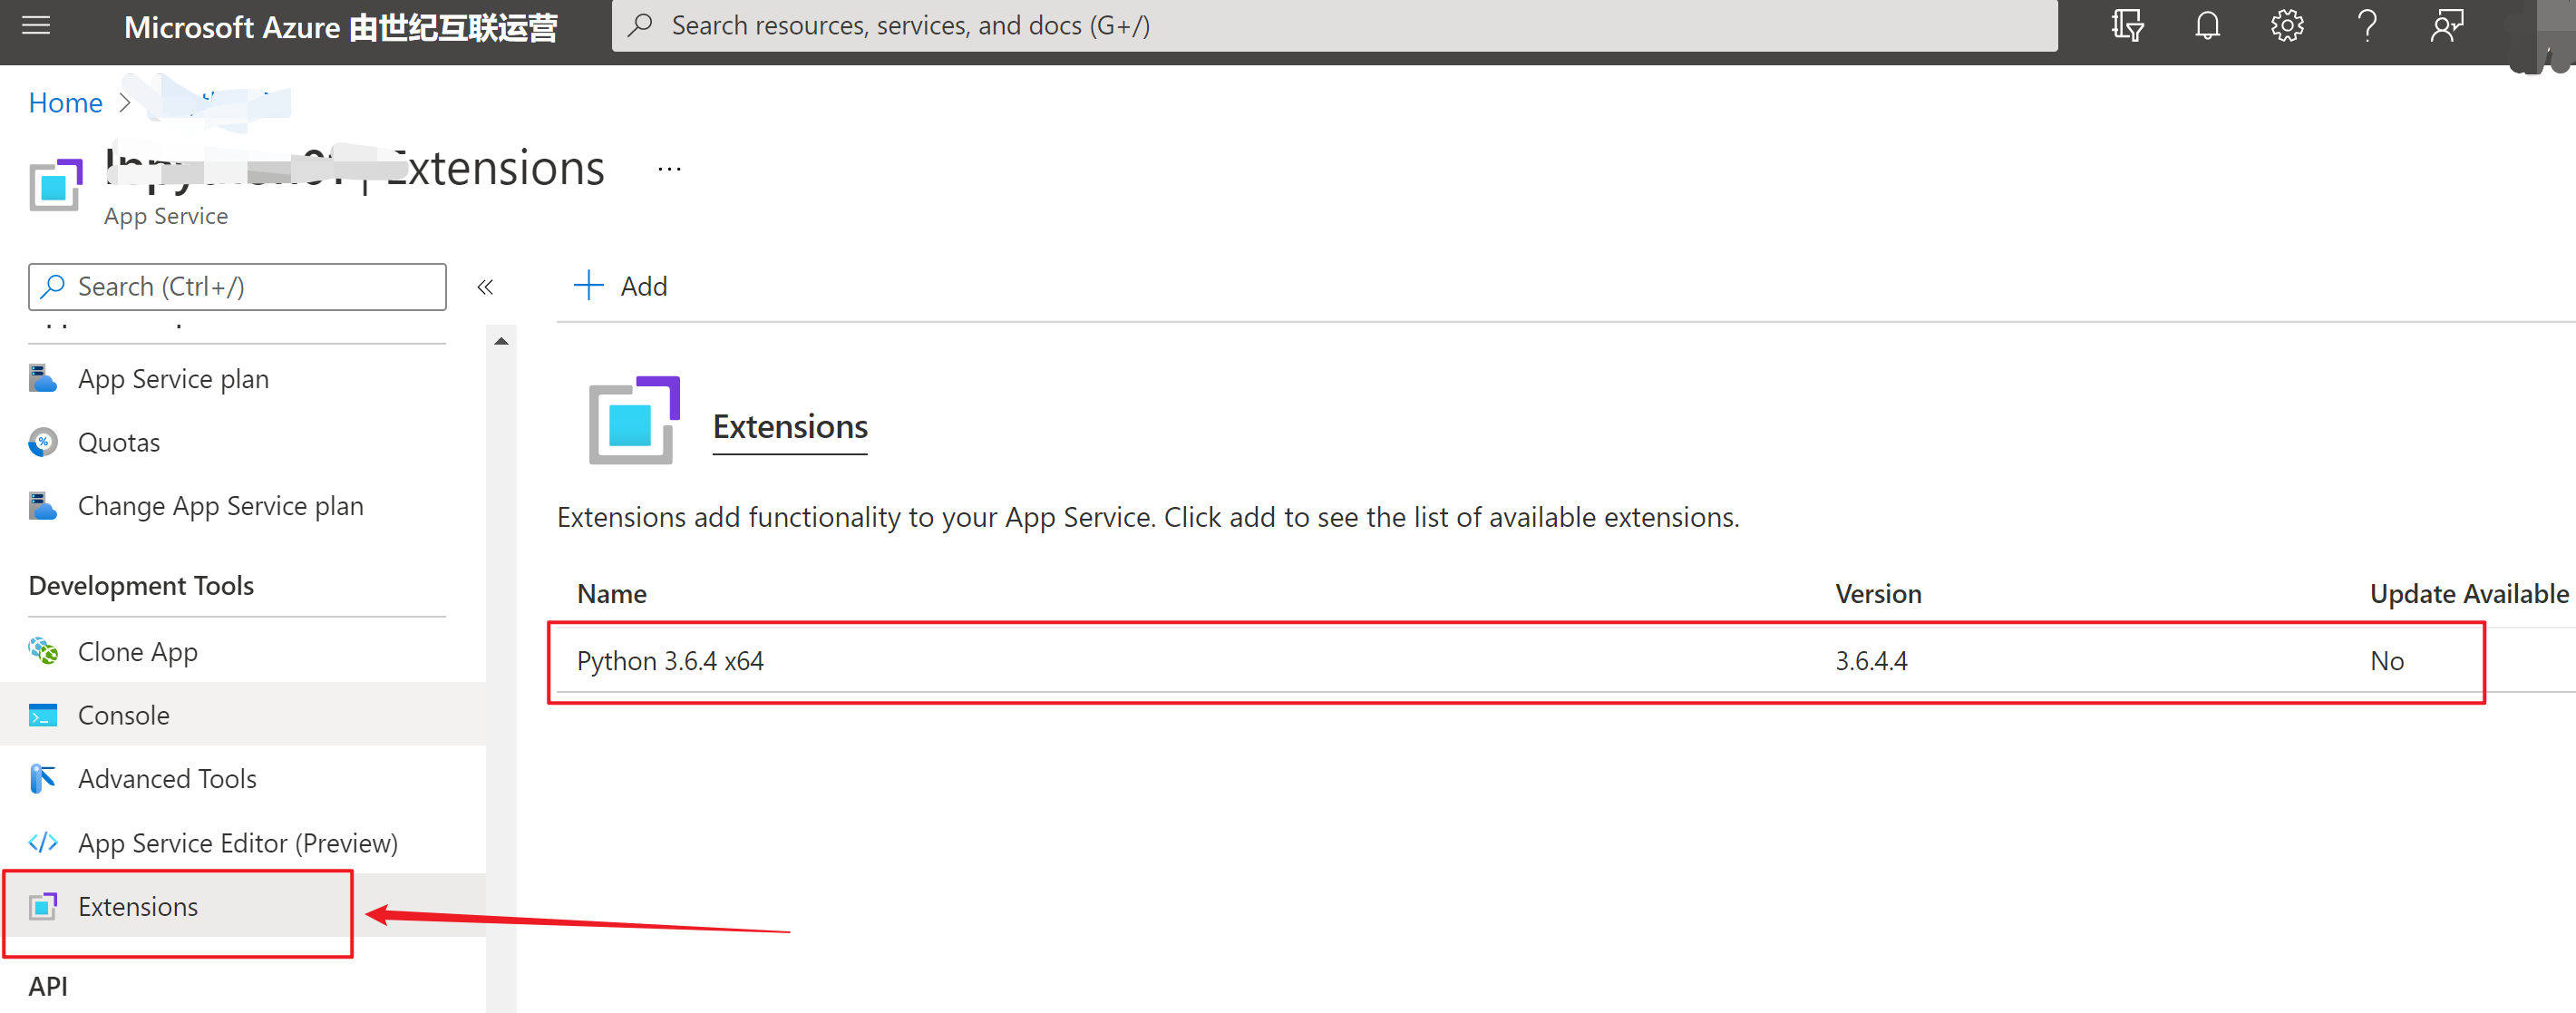 【Azure 應用服務】Python flask 應用部署在Aure App Service 遇見的 3 個問題